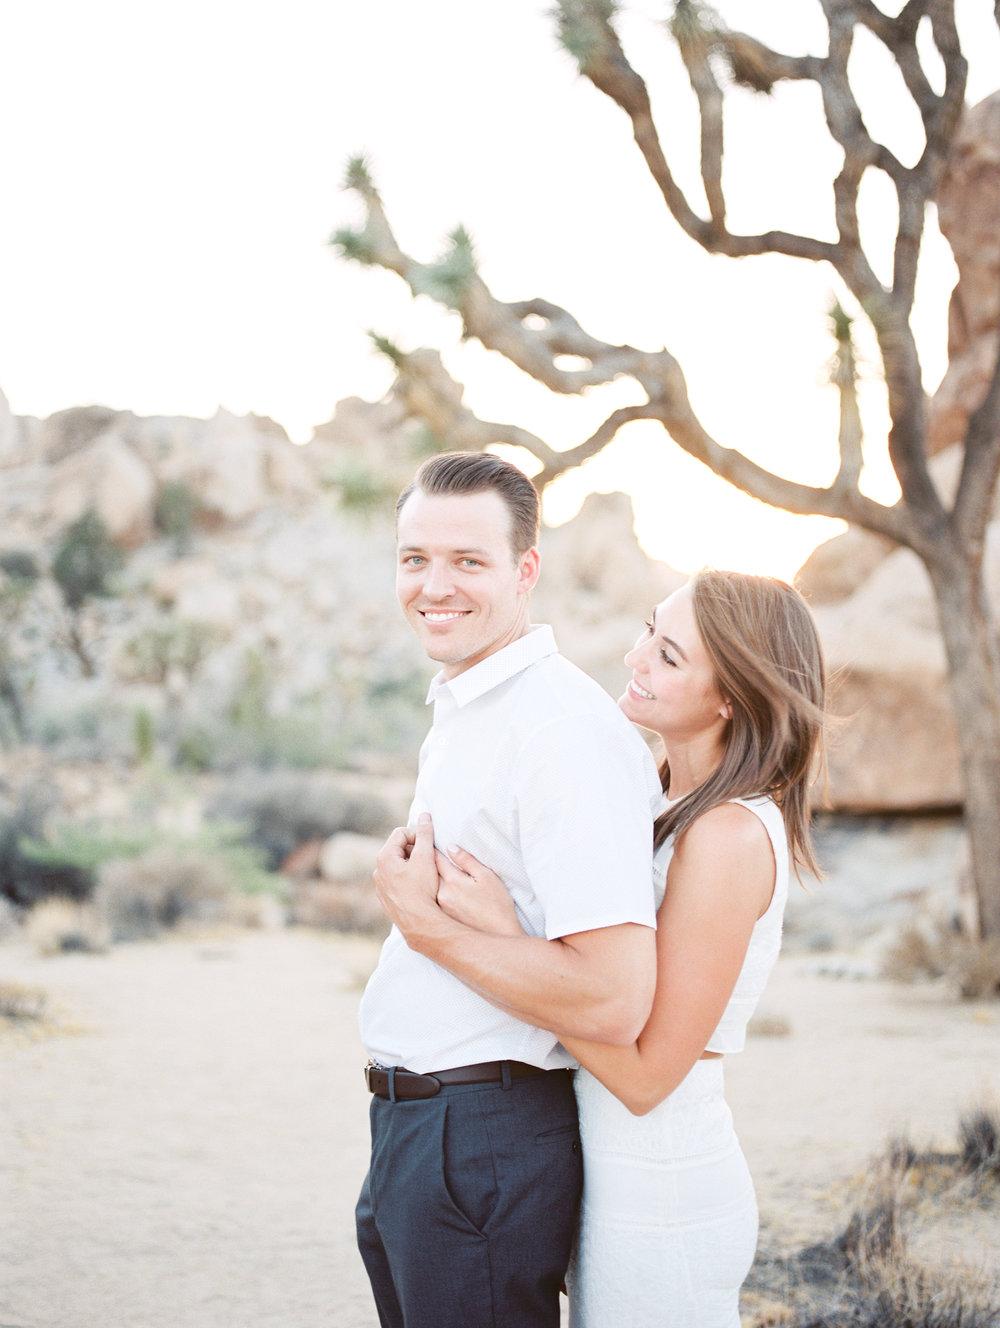 Nick + Stephanie - Joshua tree